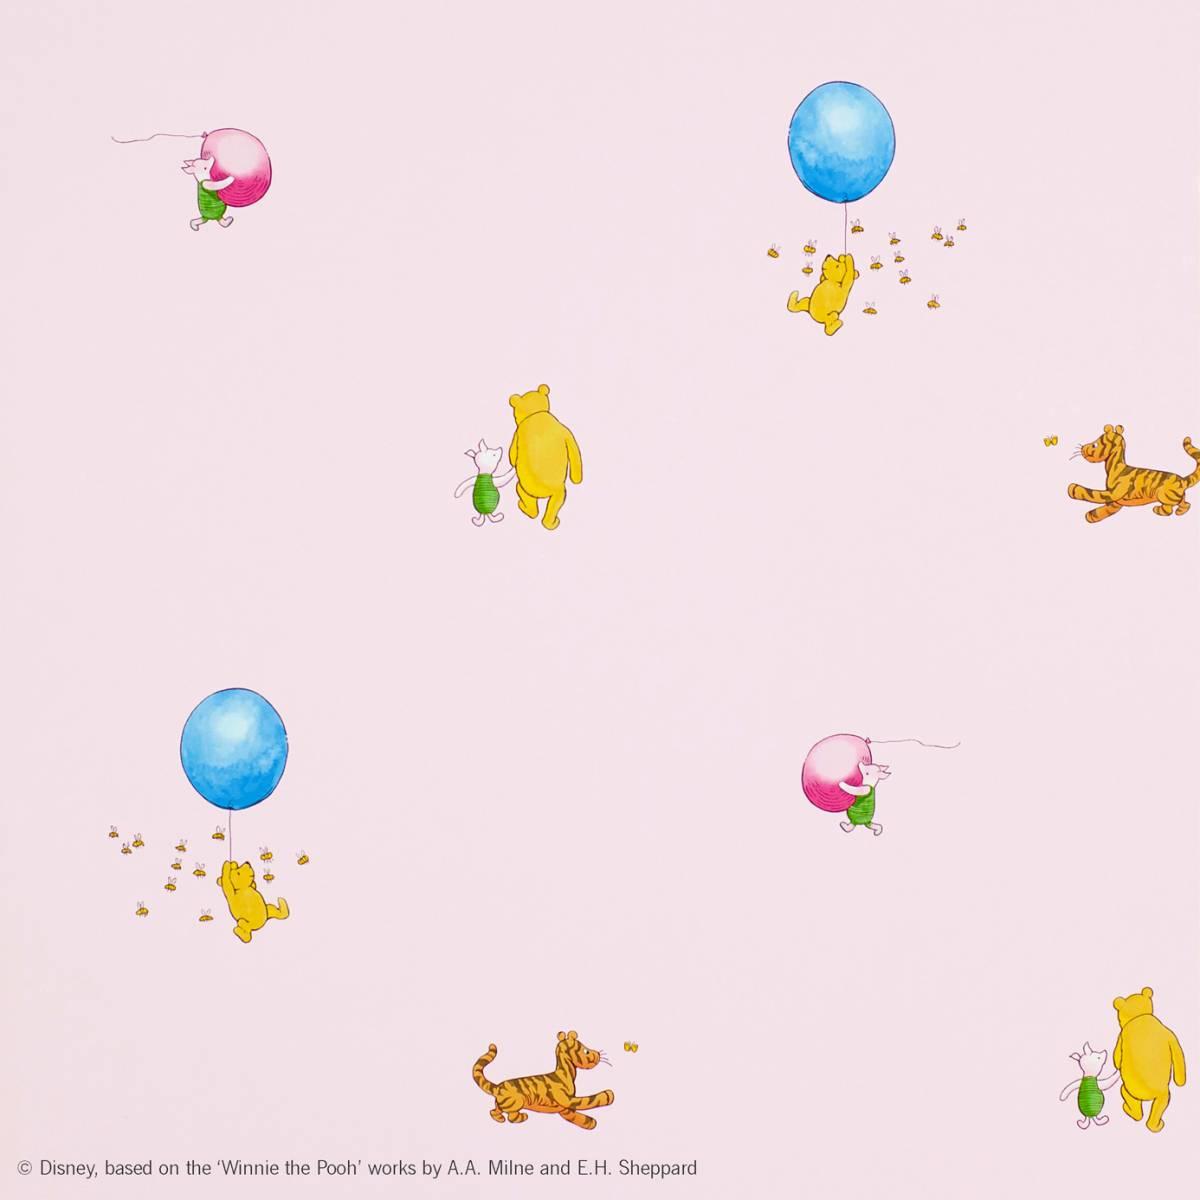 Jane Churchill Winnie The Pooh Balloon Wallpaper Pinkproduct Code J128w 03